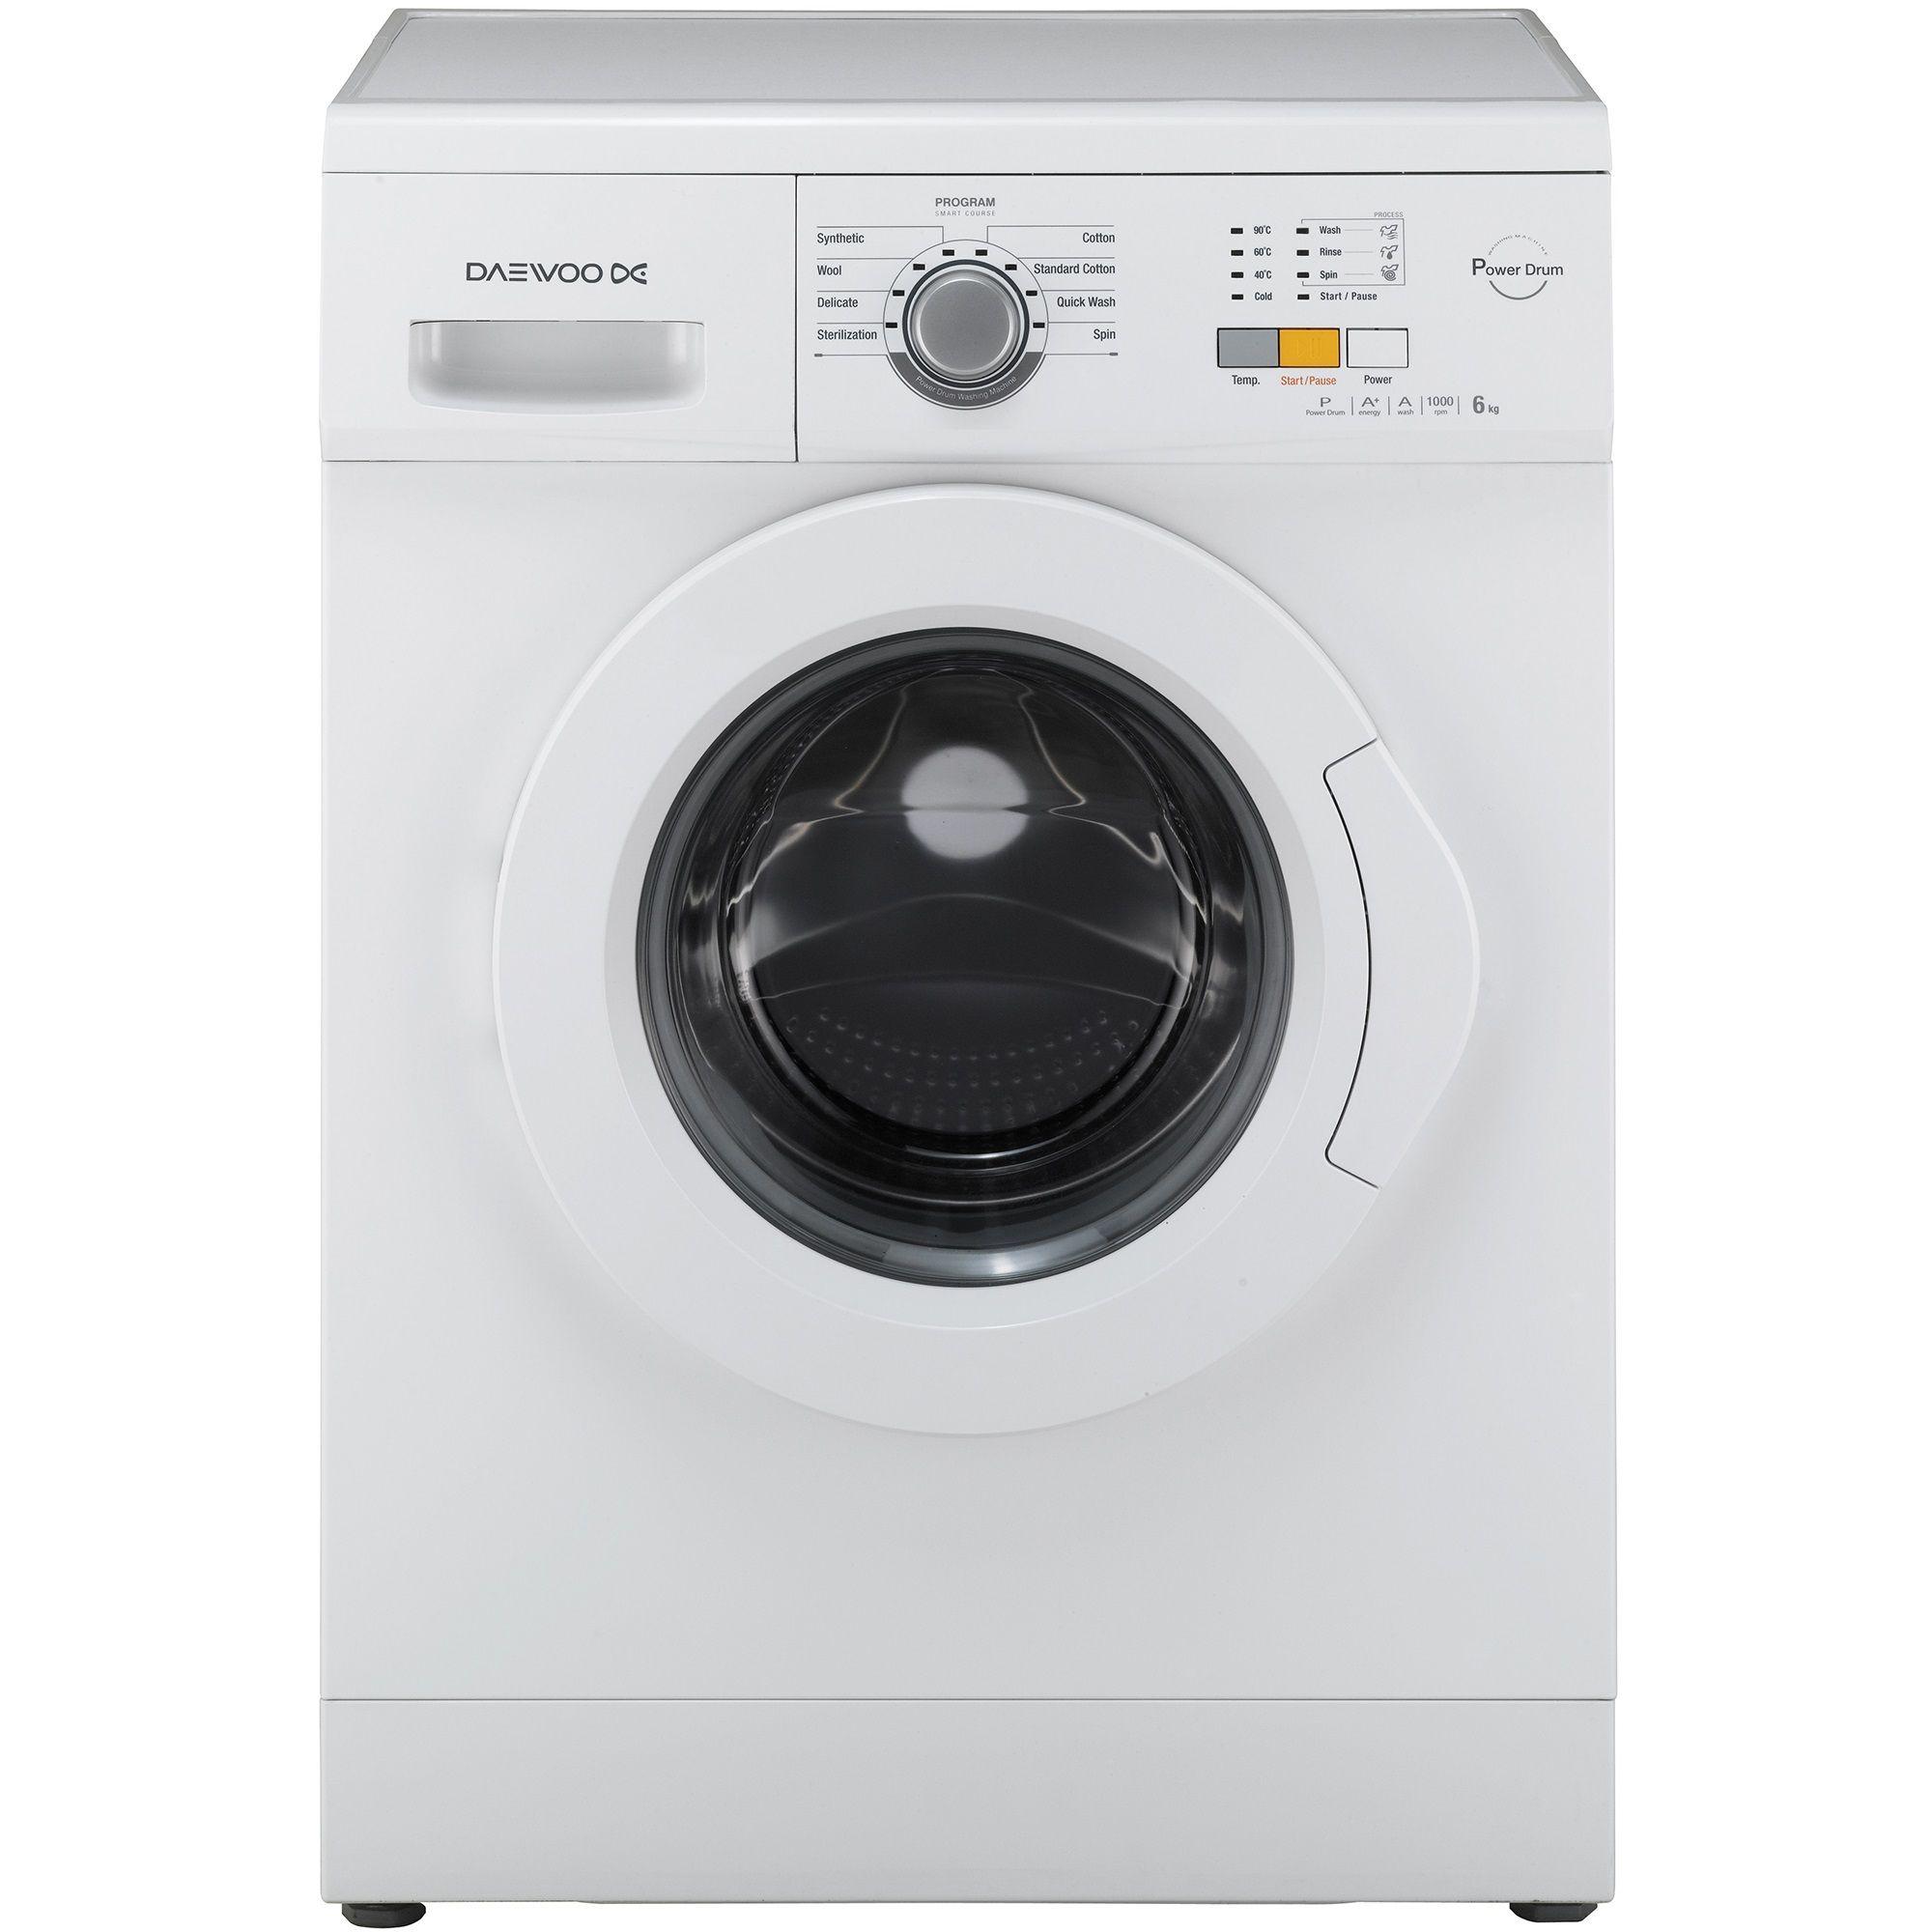 Daewoo Dwd Mh1011 Un Model Eficient și Ieftin Gadget Review Ro Daewoo Model Laundry Machine